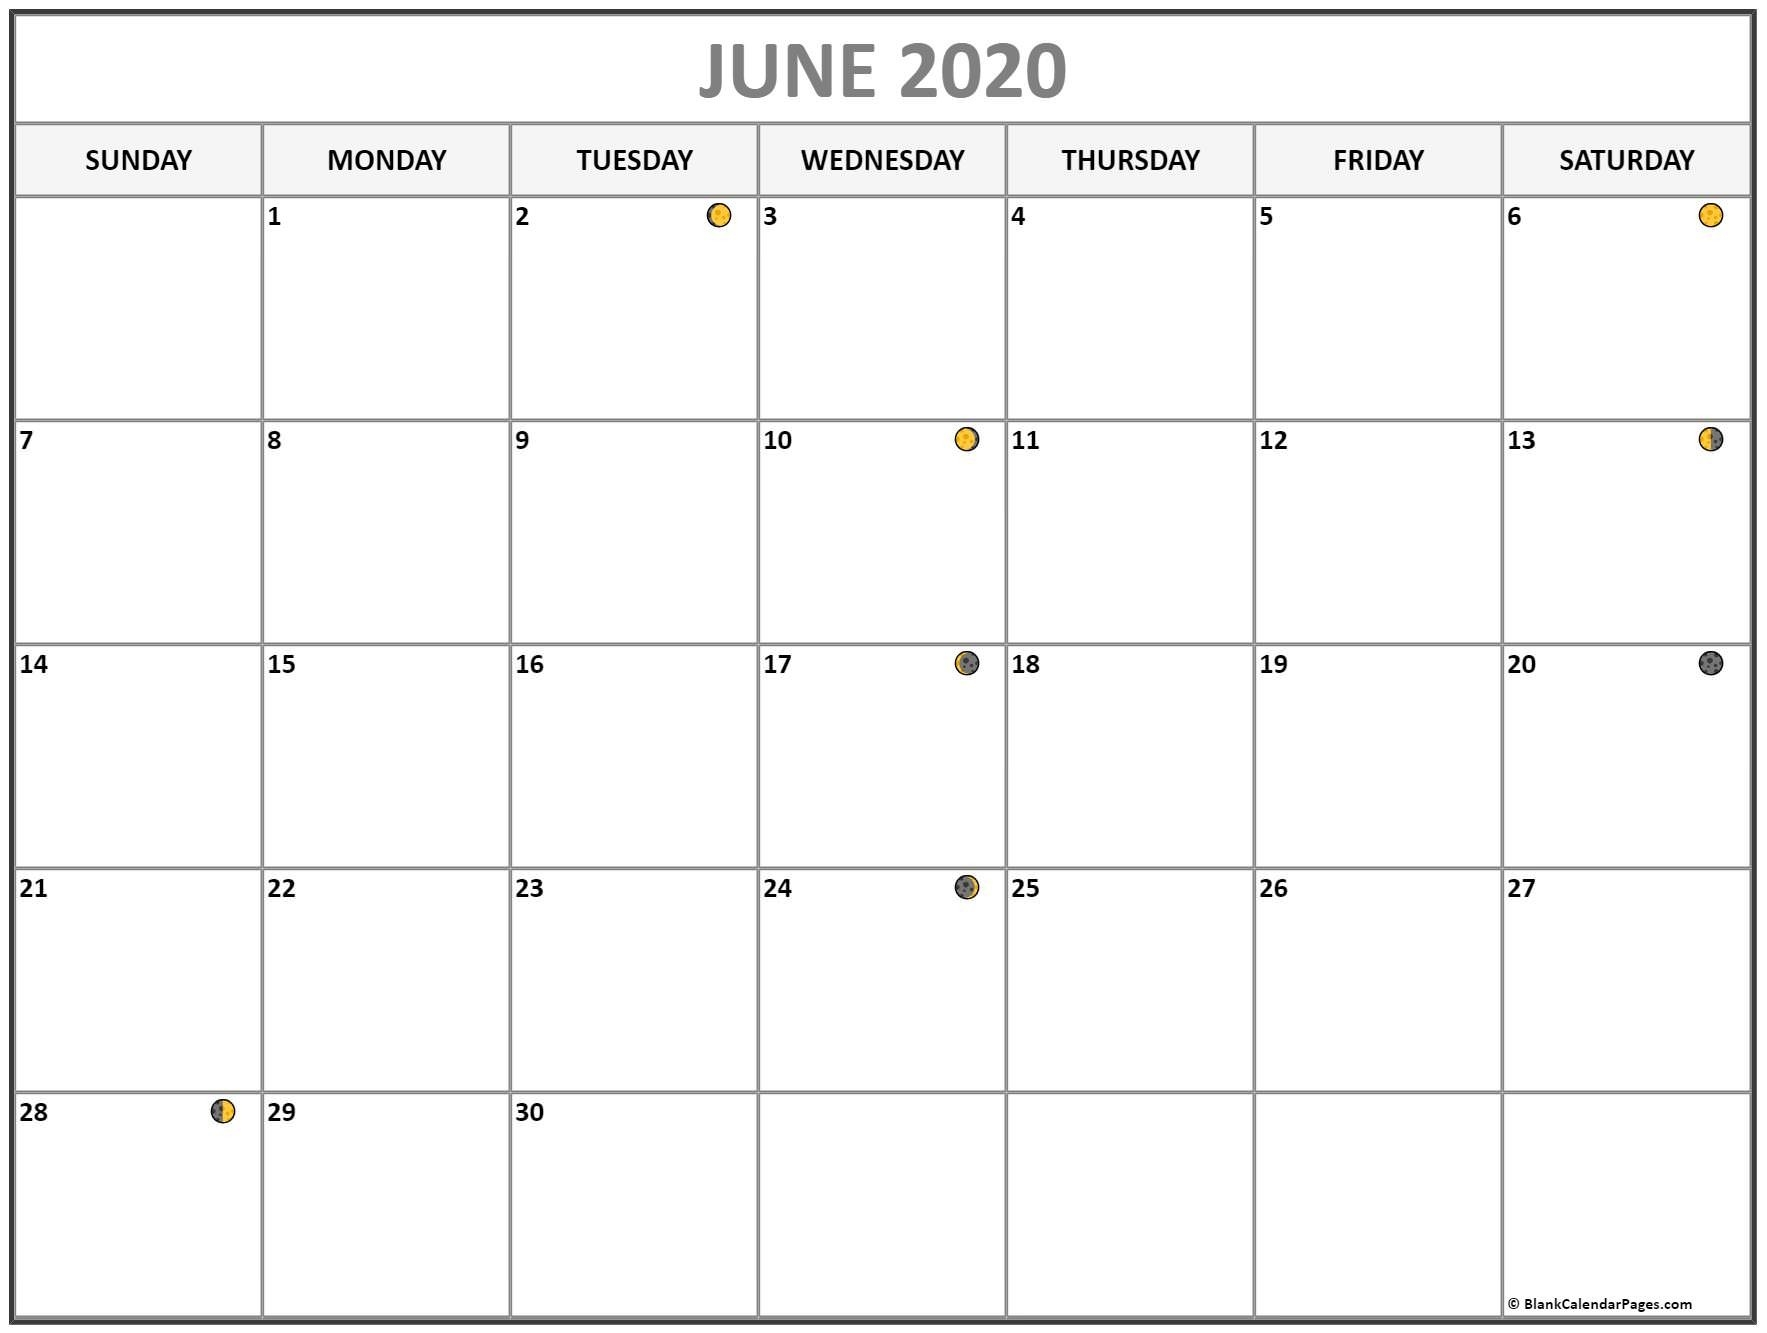 June 2020 Lunar Calendar | Moon Phase Calendar  Solar Lunar Calendar - 2020